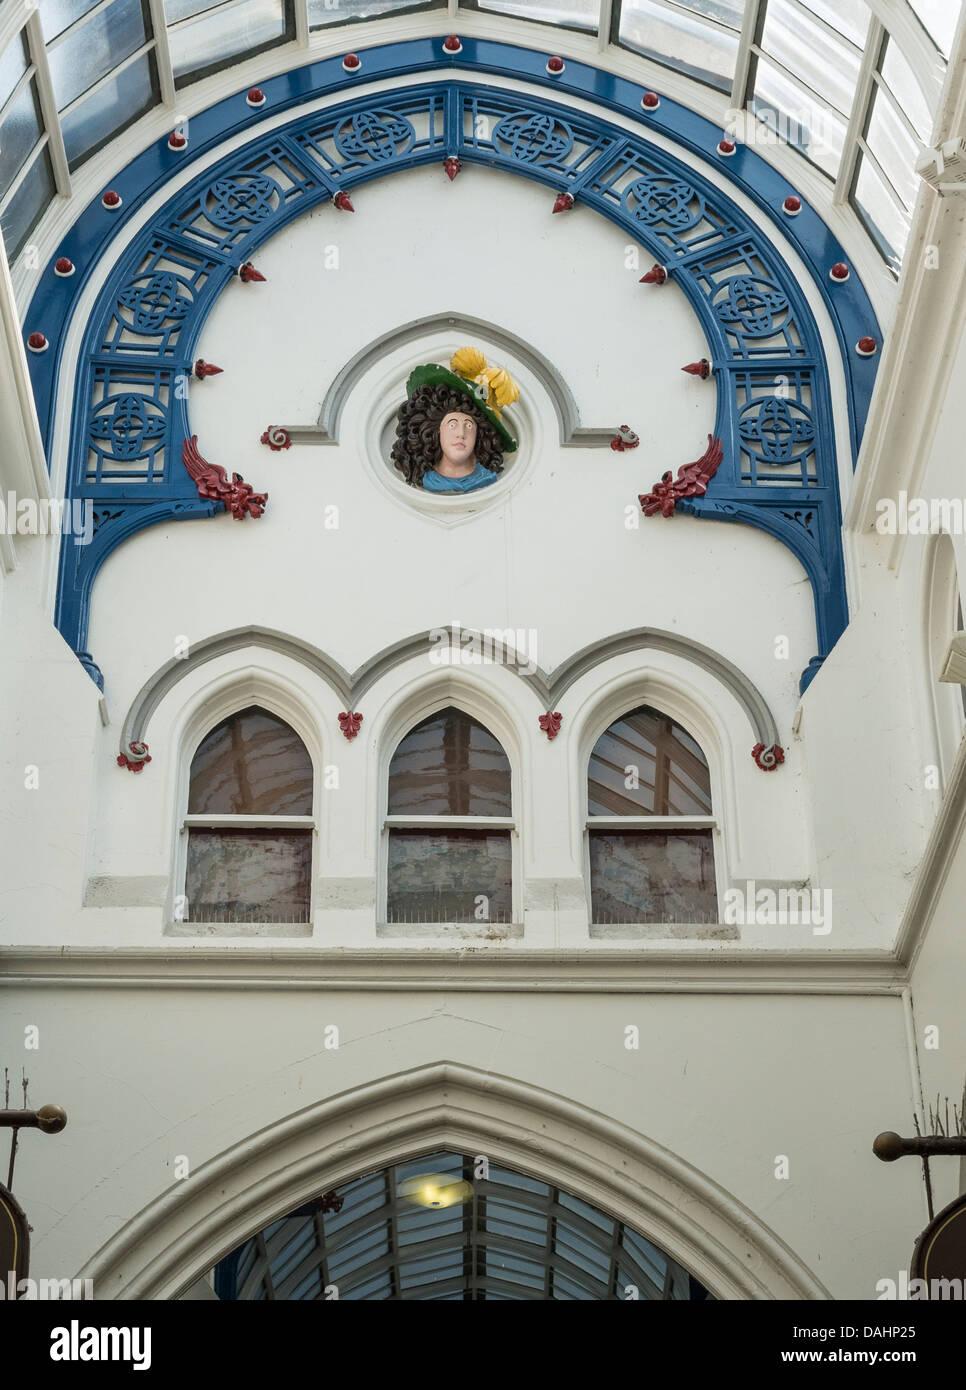 Leeds, UK. Thorntons Arcade detail. - Stock Image